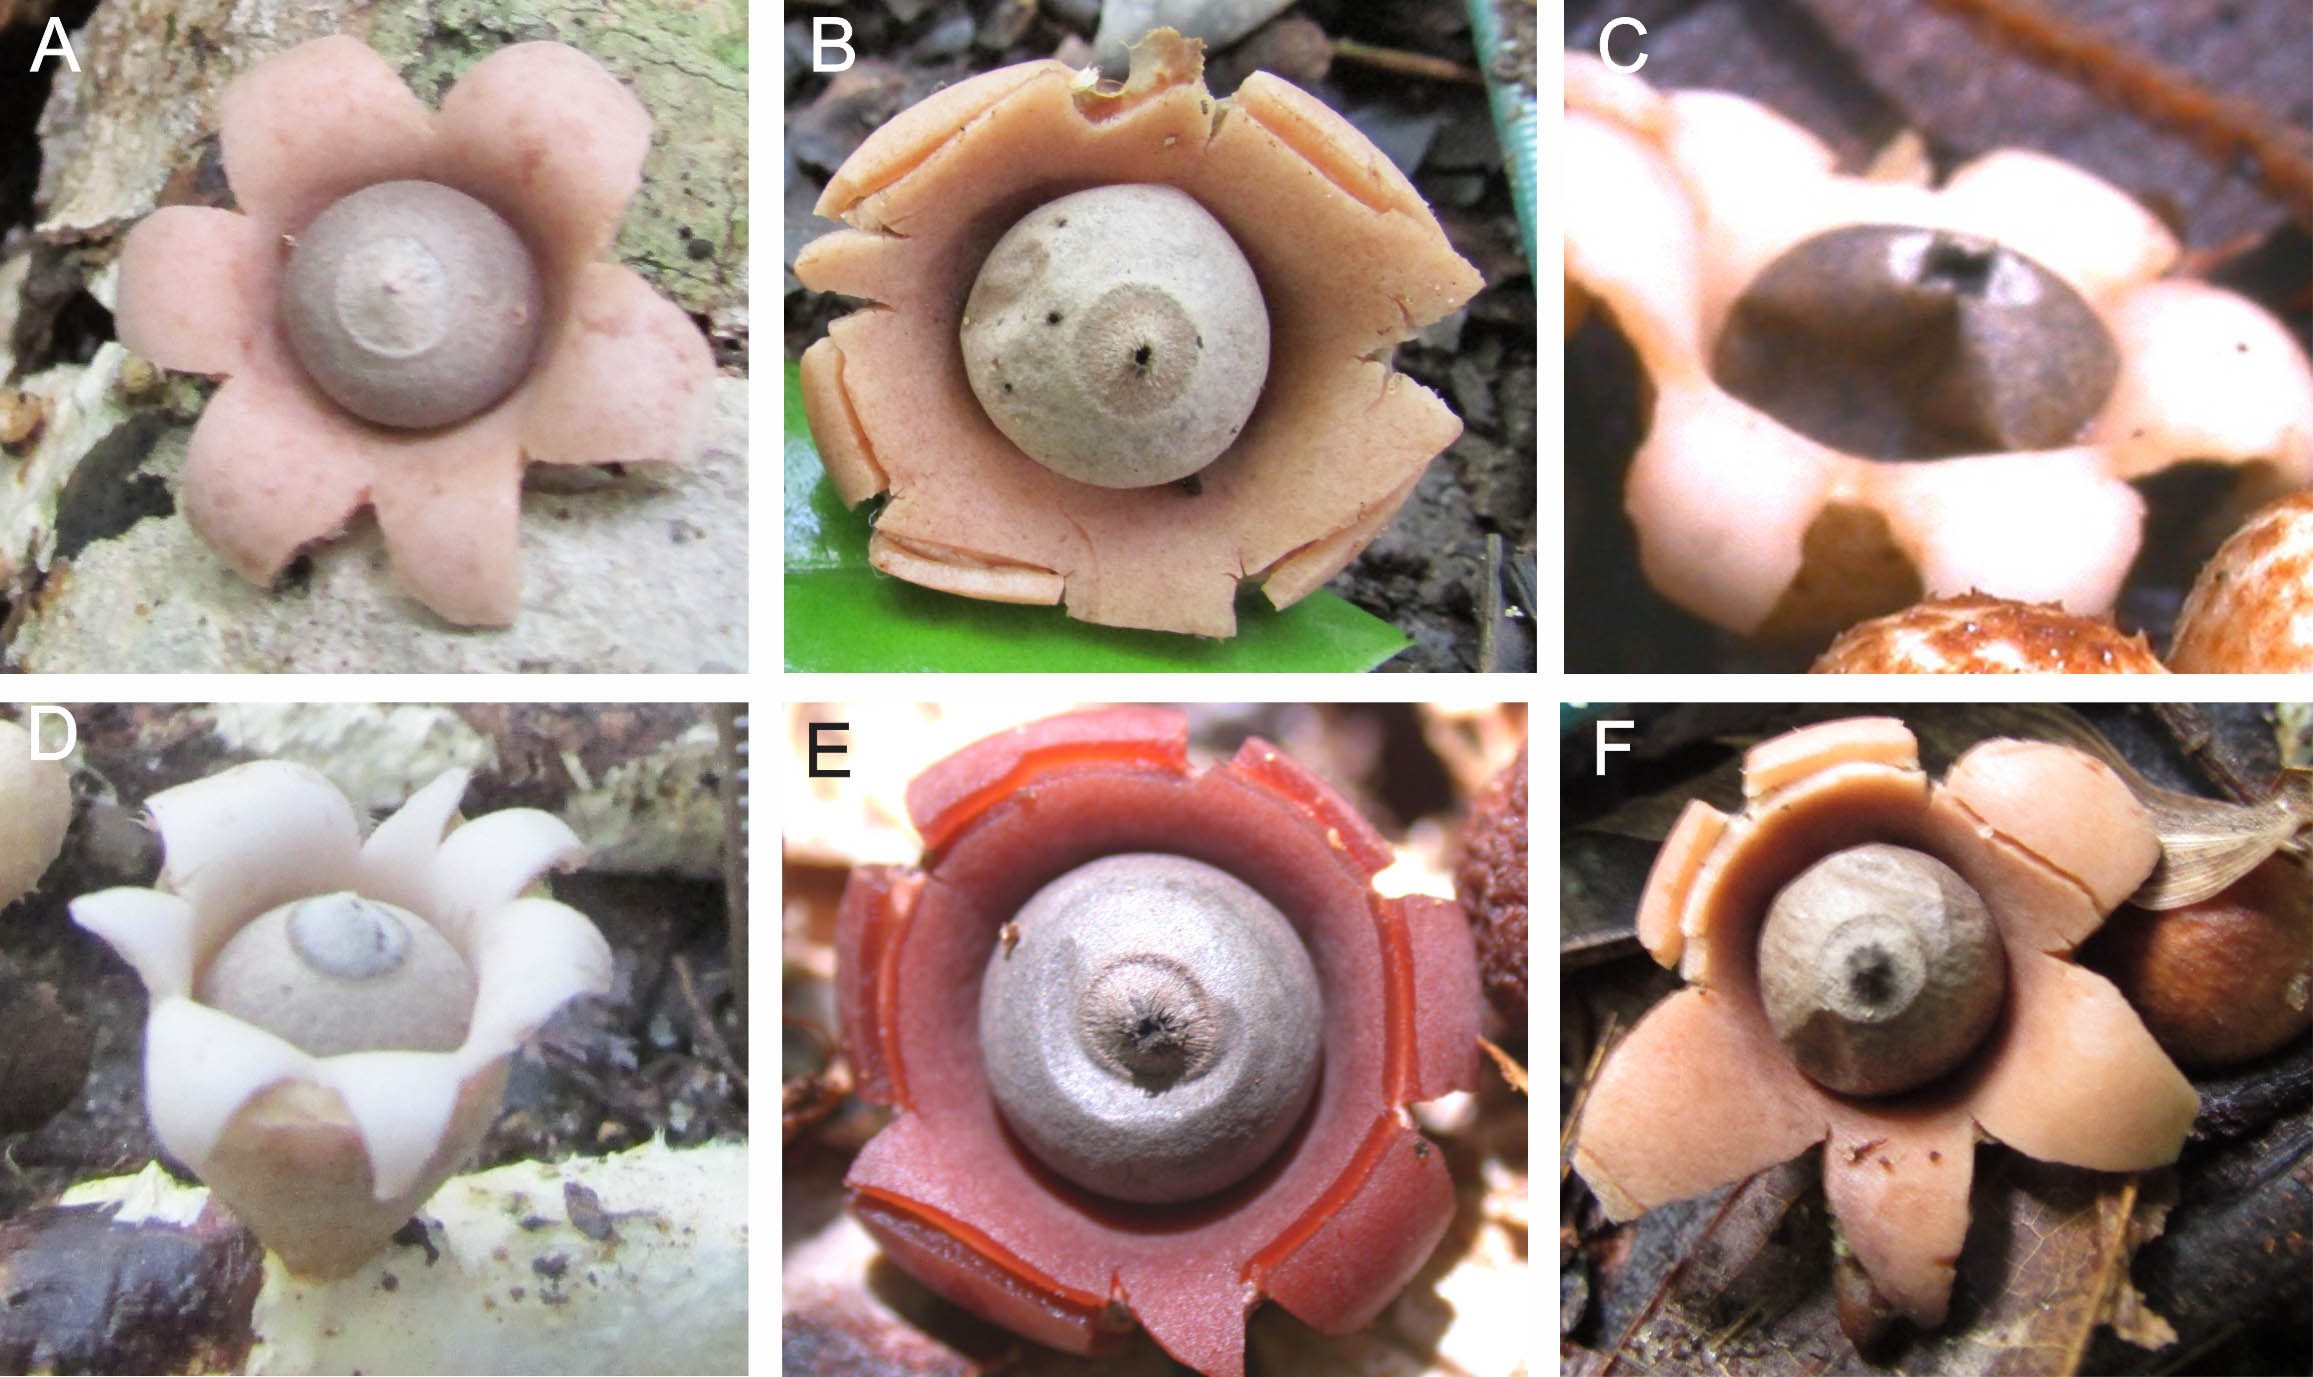 imagen de Cuerpos fructíferos de las seis especies nuevas. A) Geastrum baculycristallum, B) G. brunneocapillatum, C) G. courtecuisse, D) G. neoamericanum, E) G. rubellum, F) G. rubropusillum. / J.O. Sousa